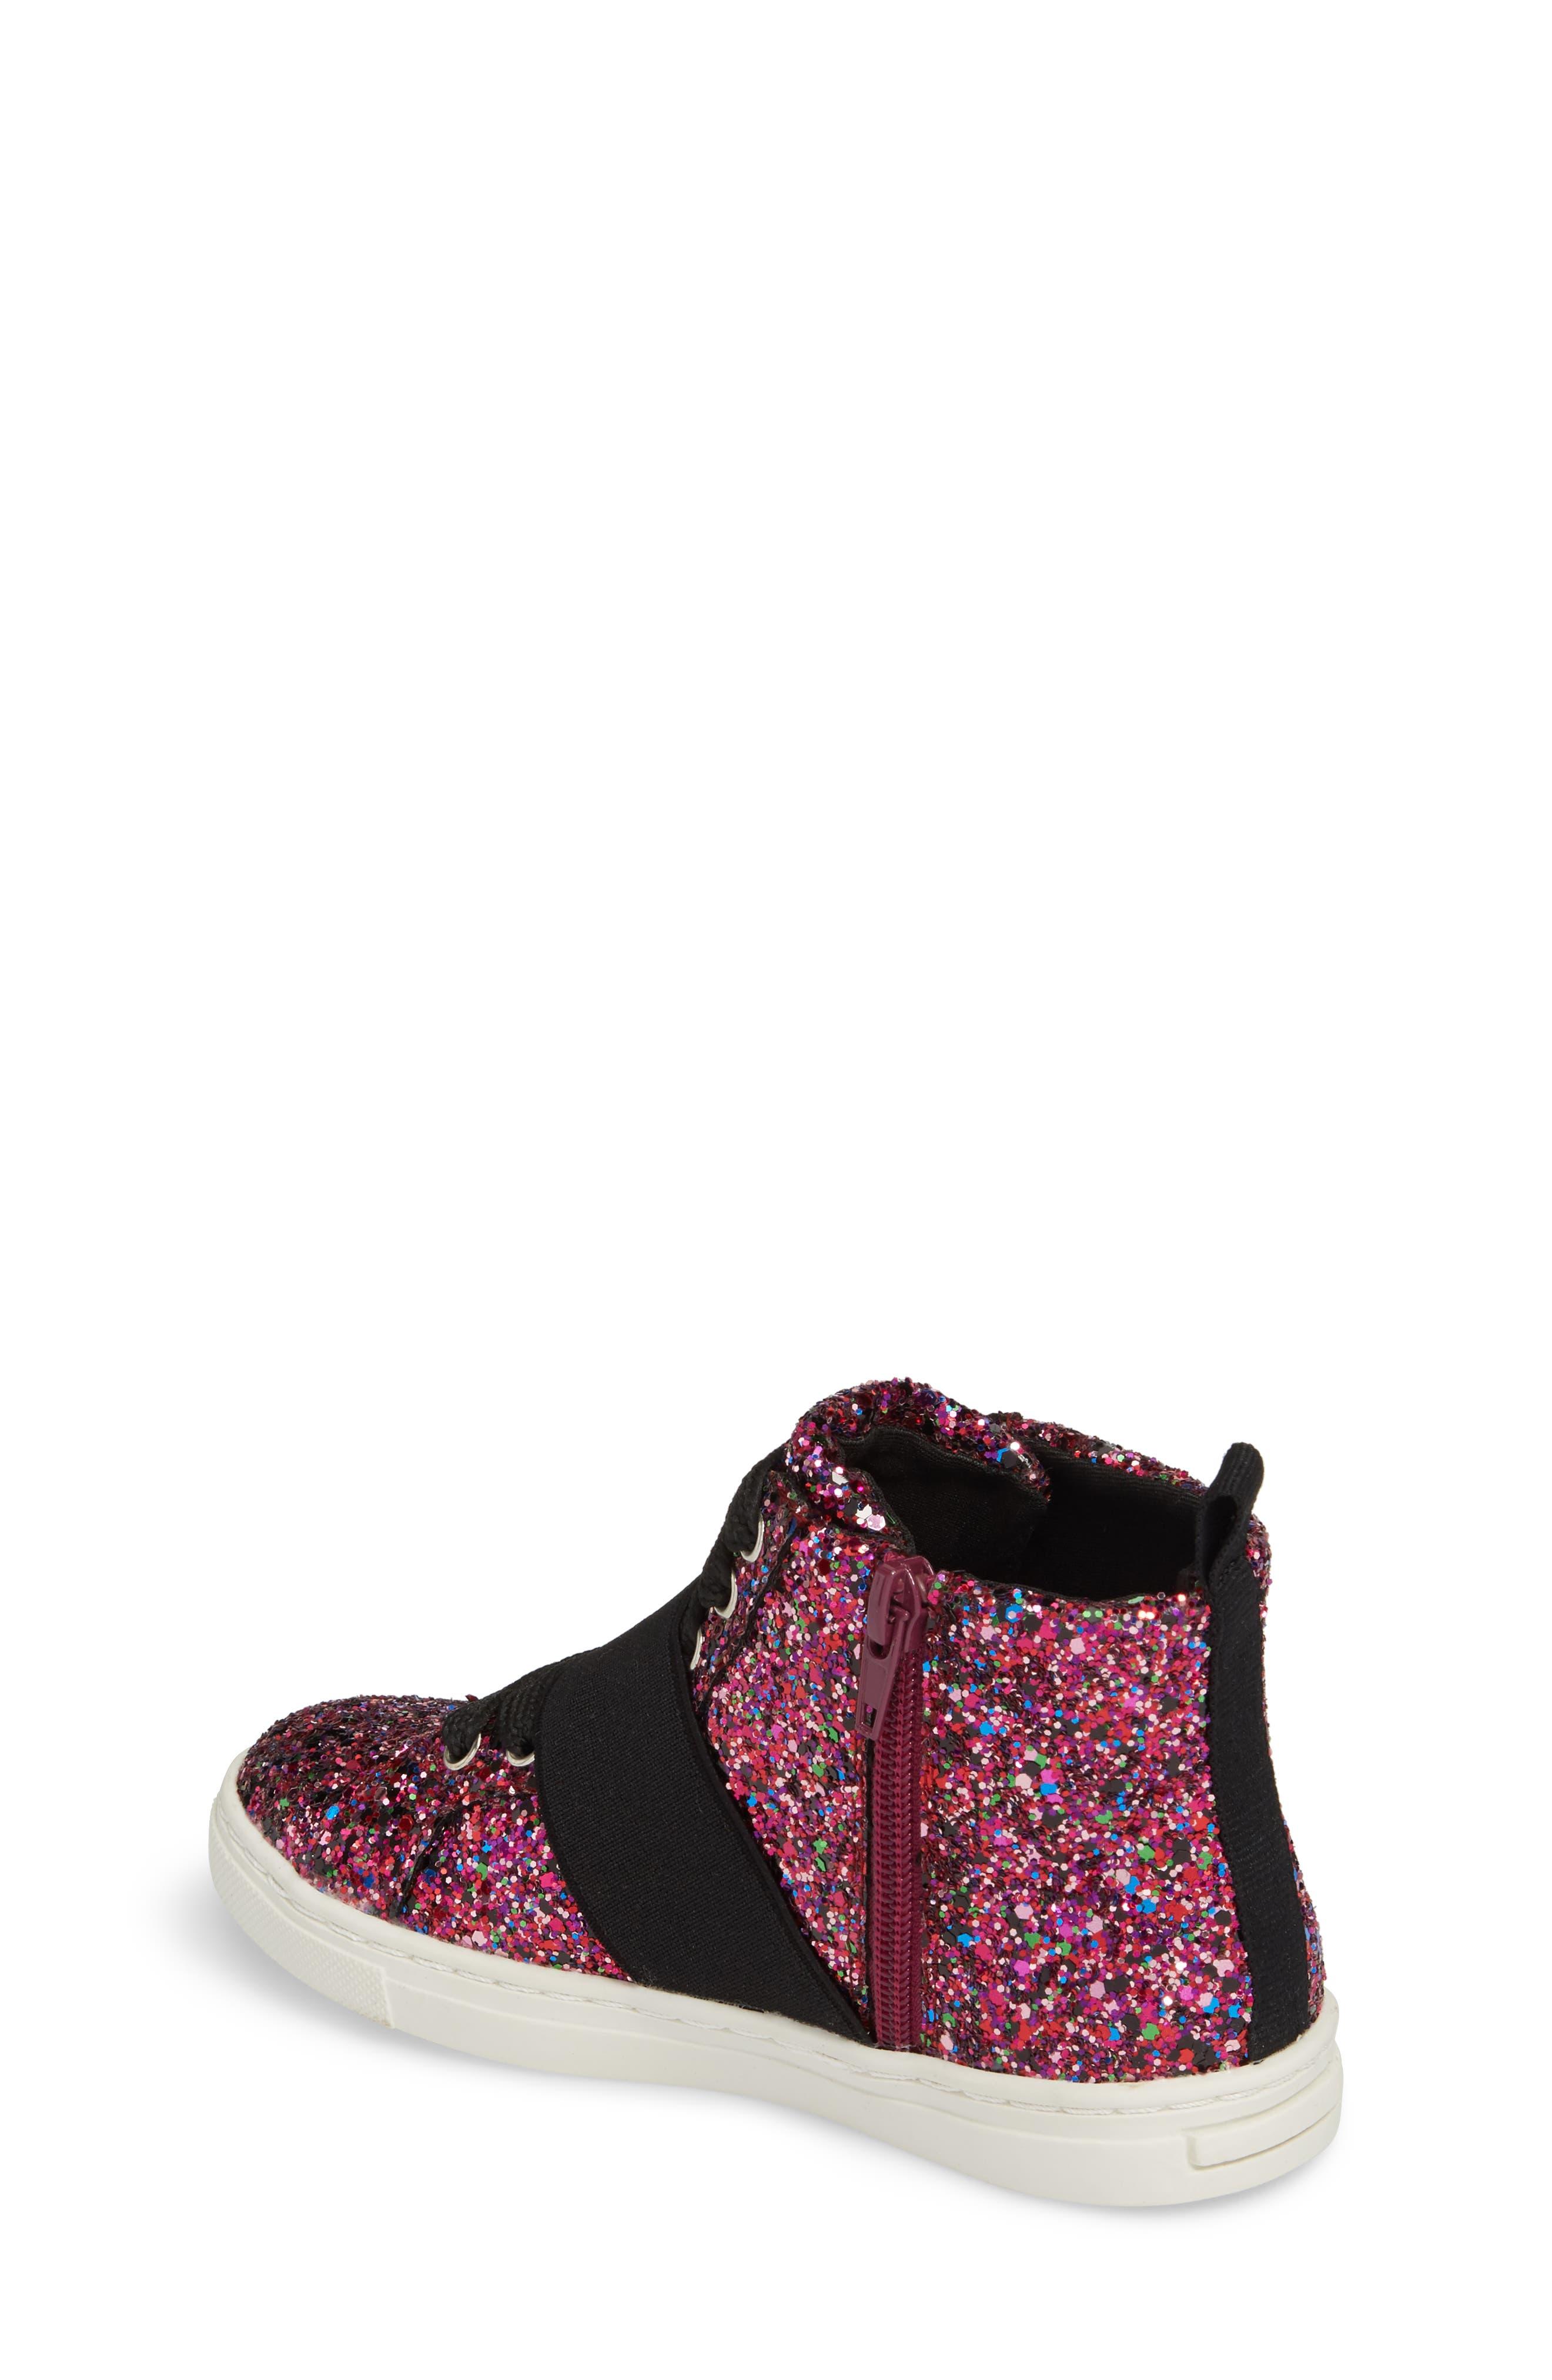 Zoa High Top Sneaker,                             Alternate thumbnail 2, color,                             Fuchsia Glitter